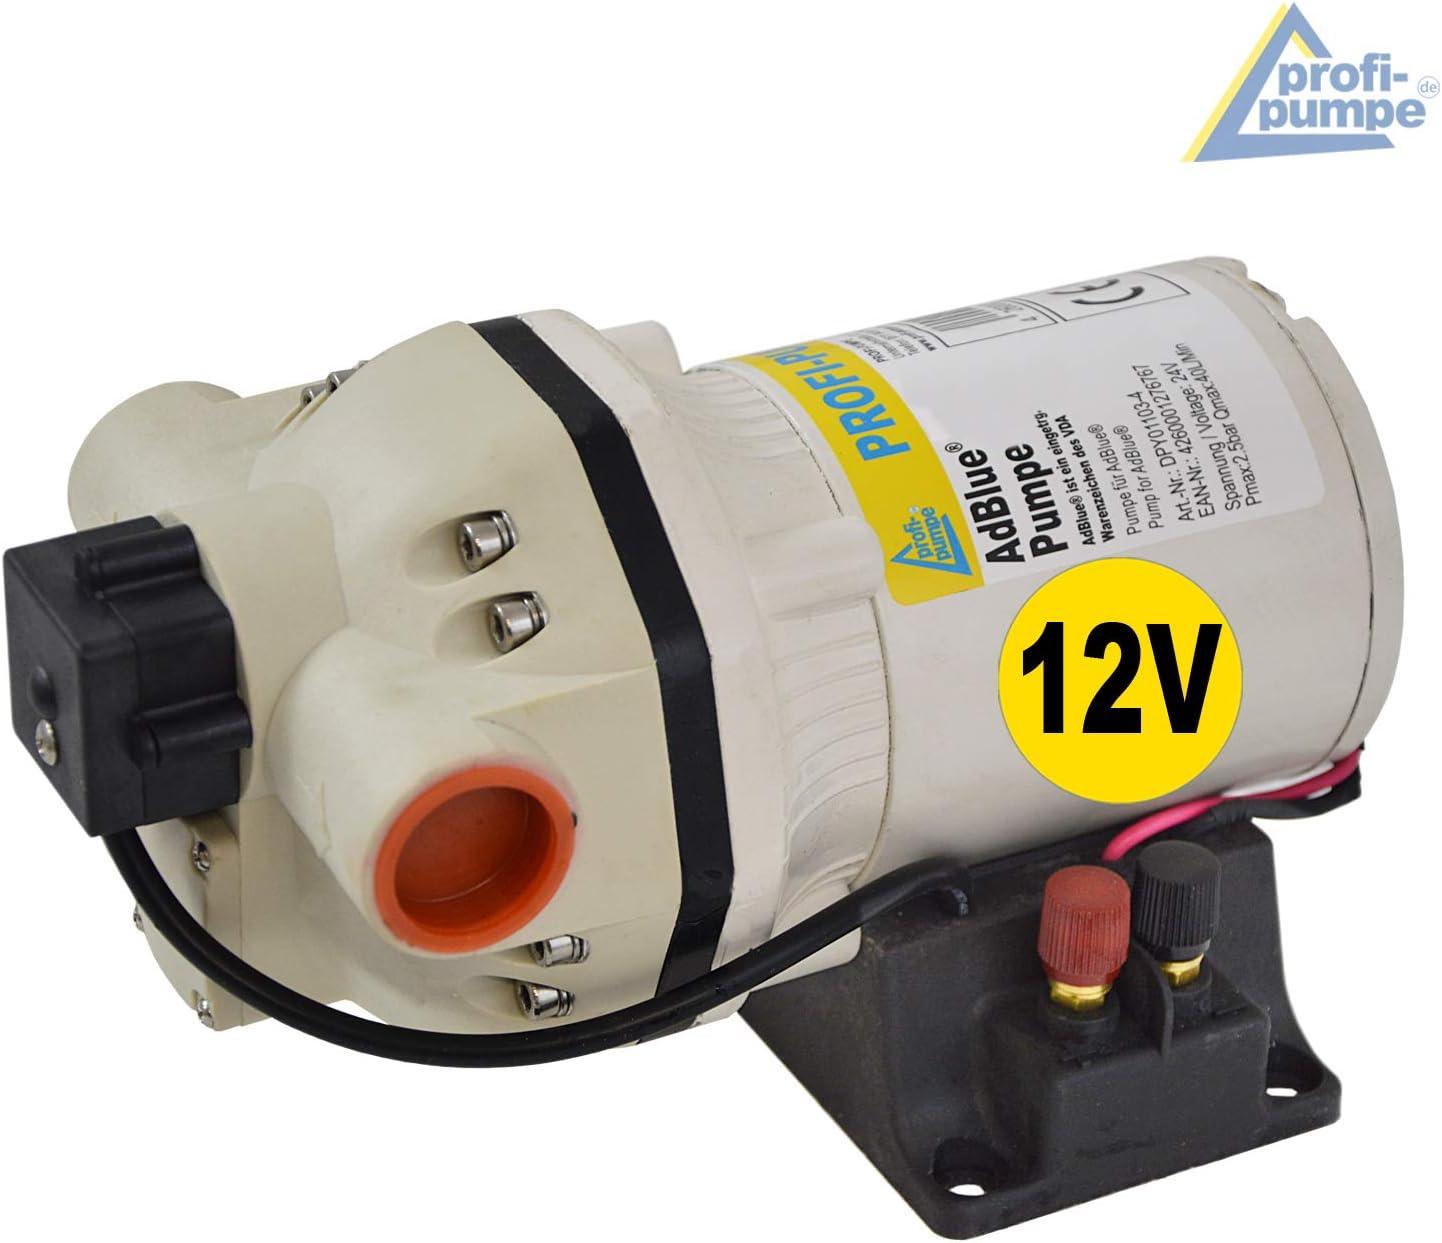 AdBlue/® 12V Urea Bomba Tanking Set Membrana Bomba Qu/ímica Autocebante Potente Motor El/éctrico con Bobina de Cobre